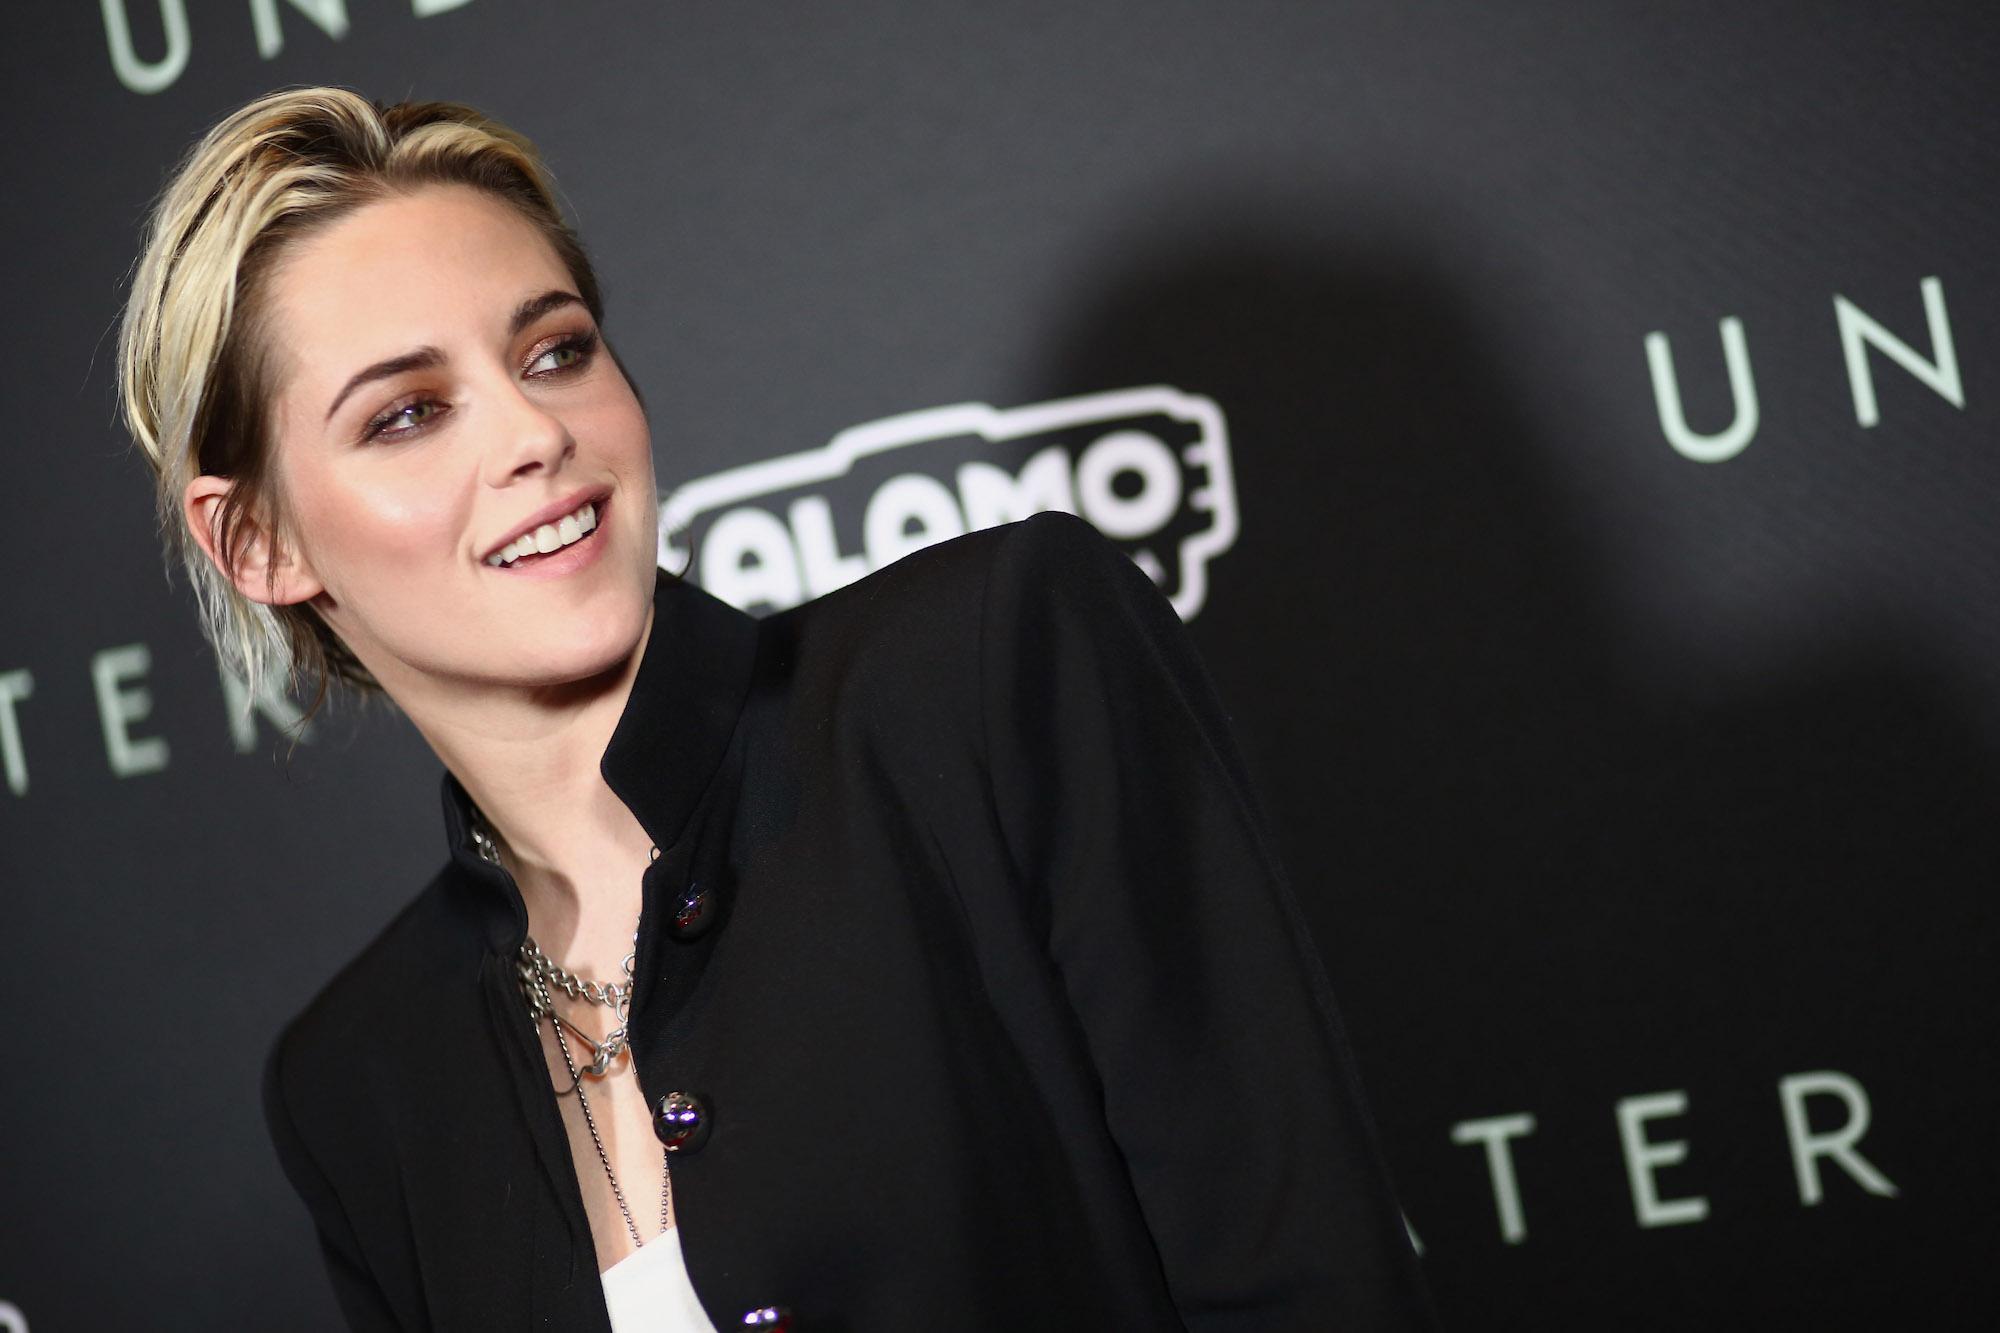 Kristen Stewart at the Special Fan Screening Of 20th Century Fox's 'Underwater' at Alamo Drafthouse Cinema on Jan. 07, 2020.